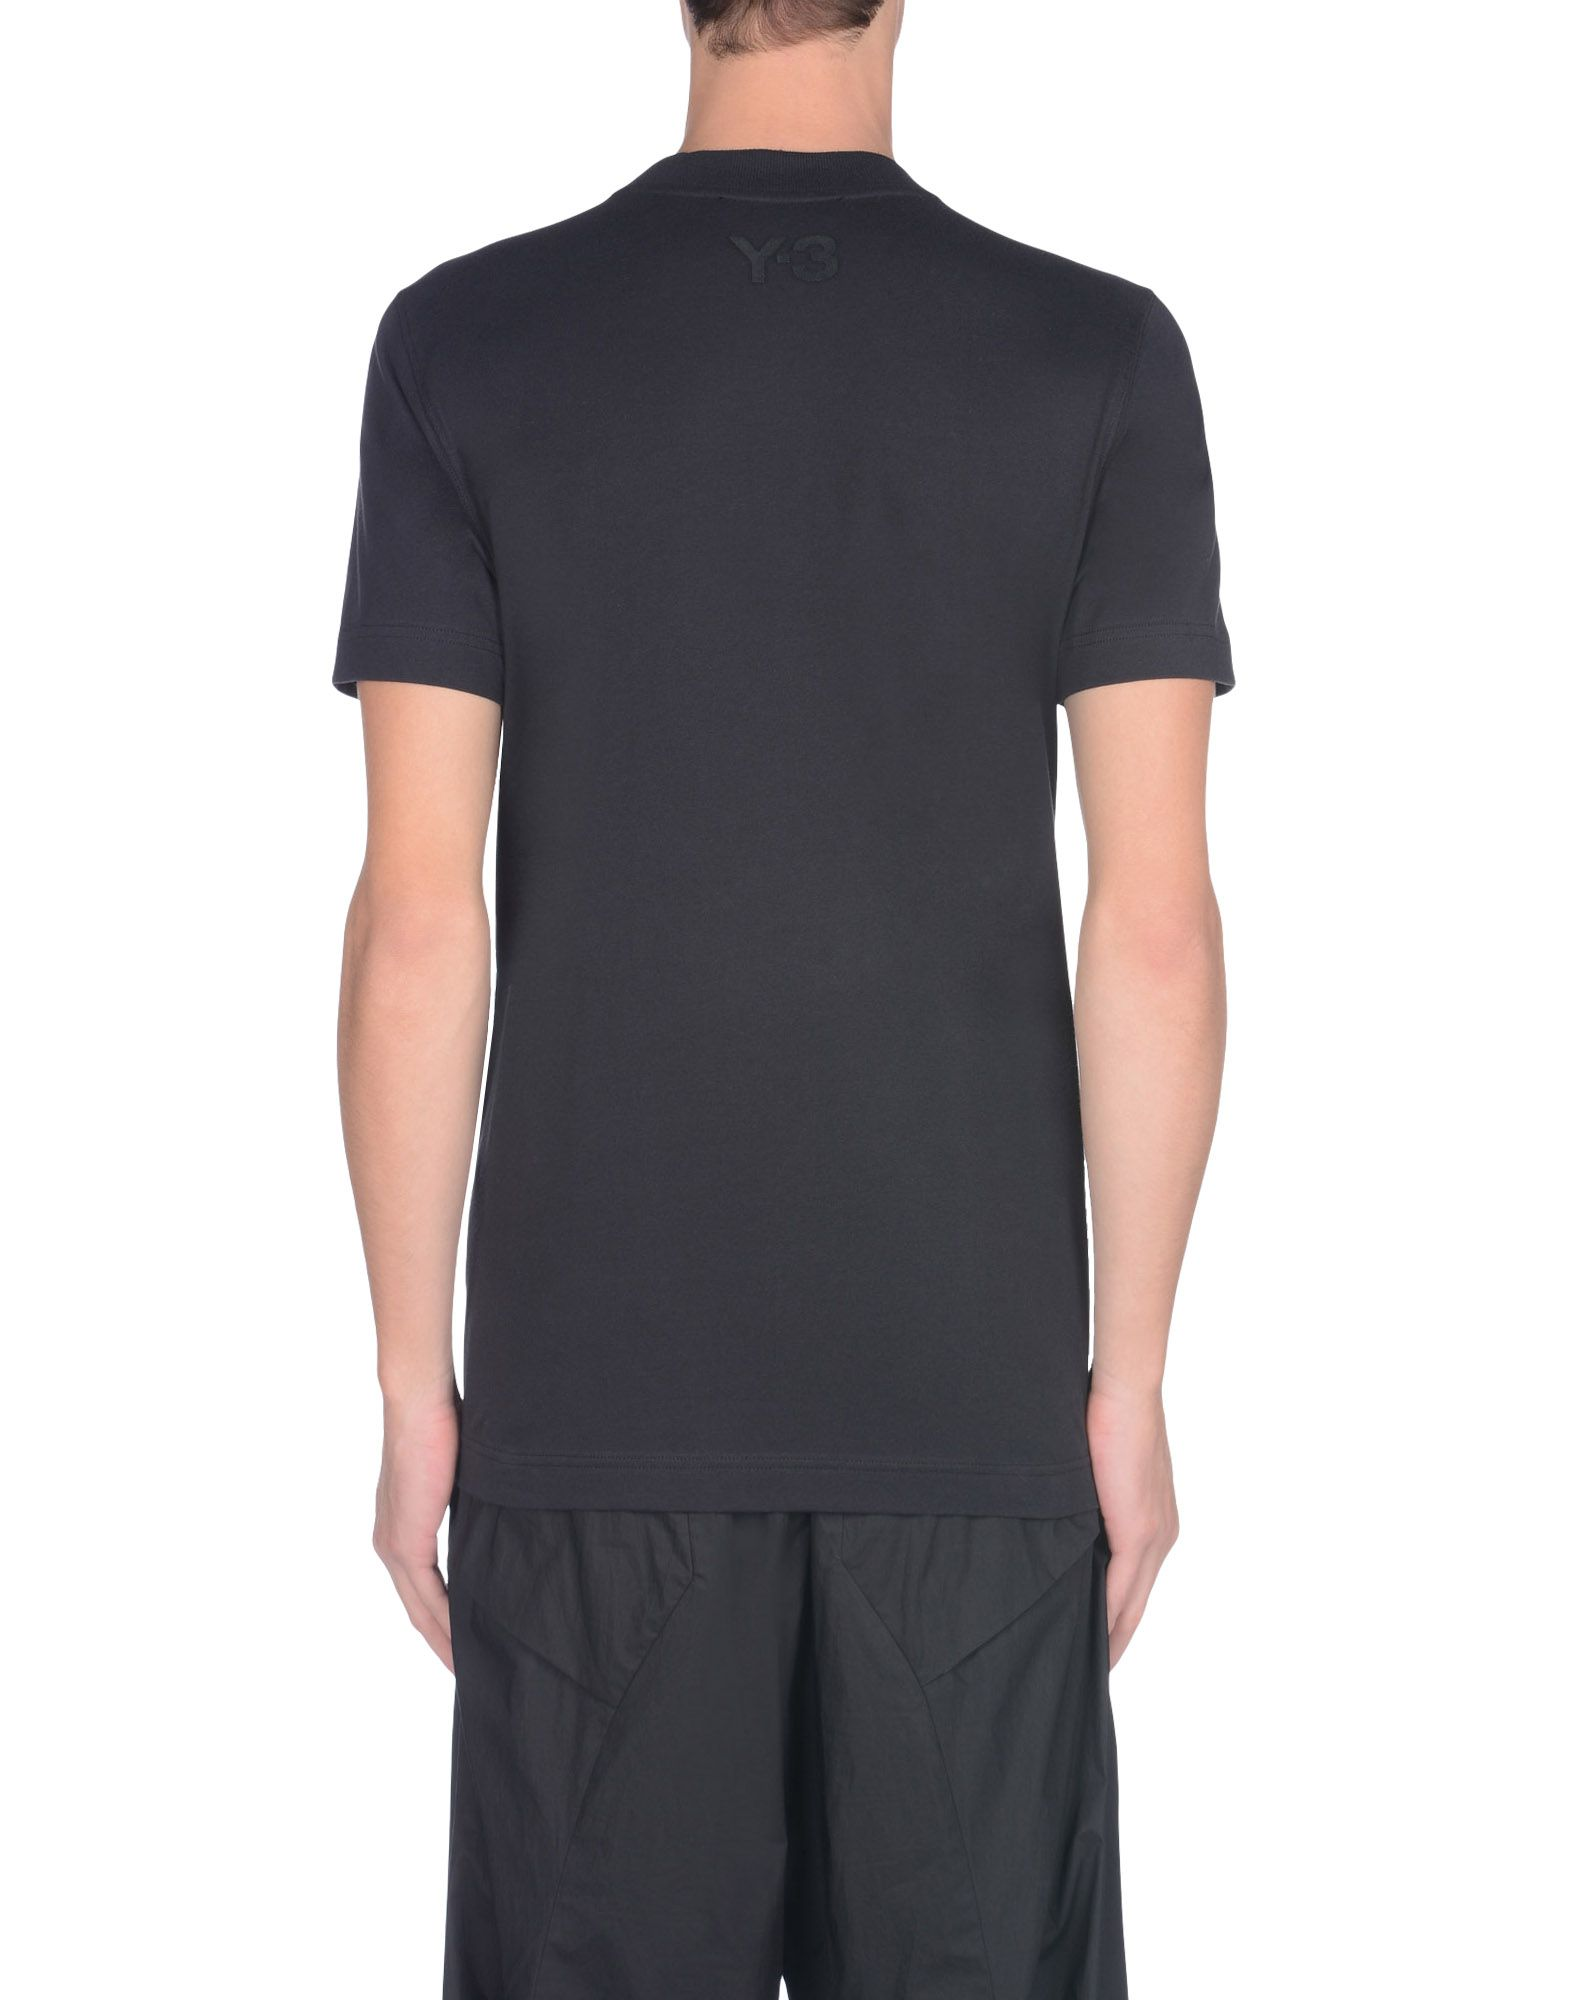 34e393171eec ... Y-3 Y-3 TV FUTURE TEE Short sleeve t-shirt Man e ...